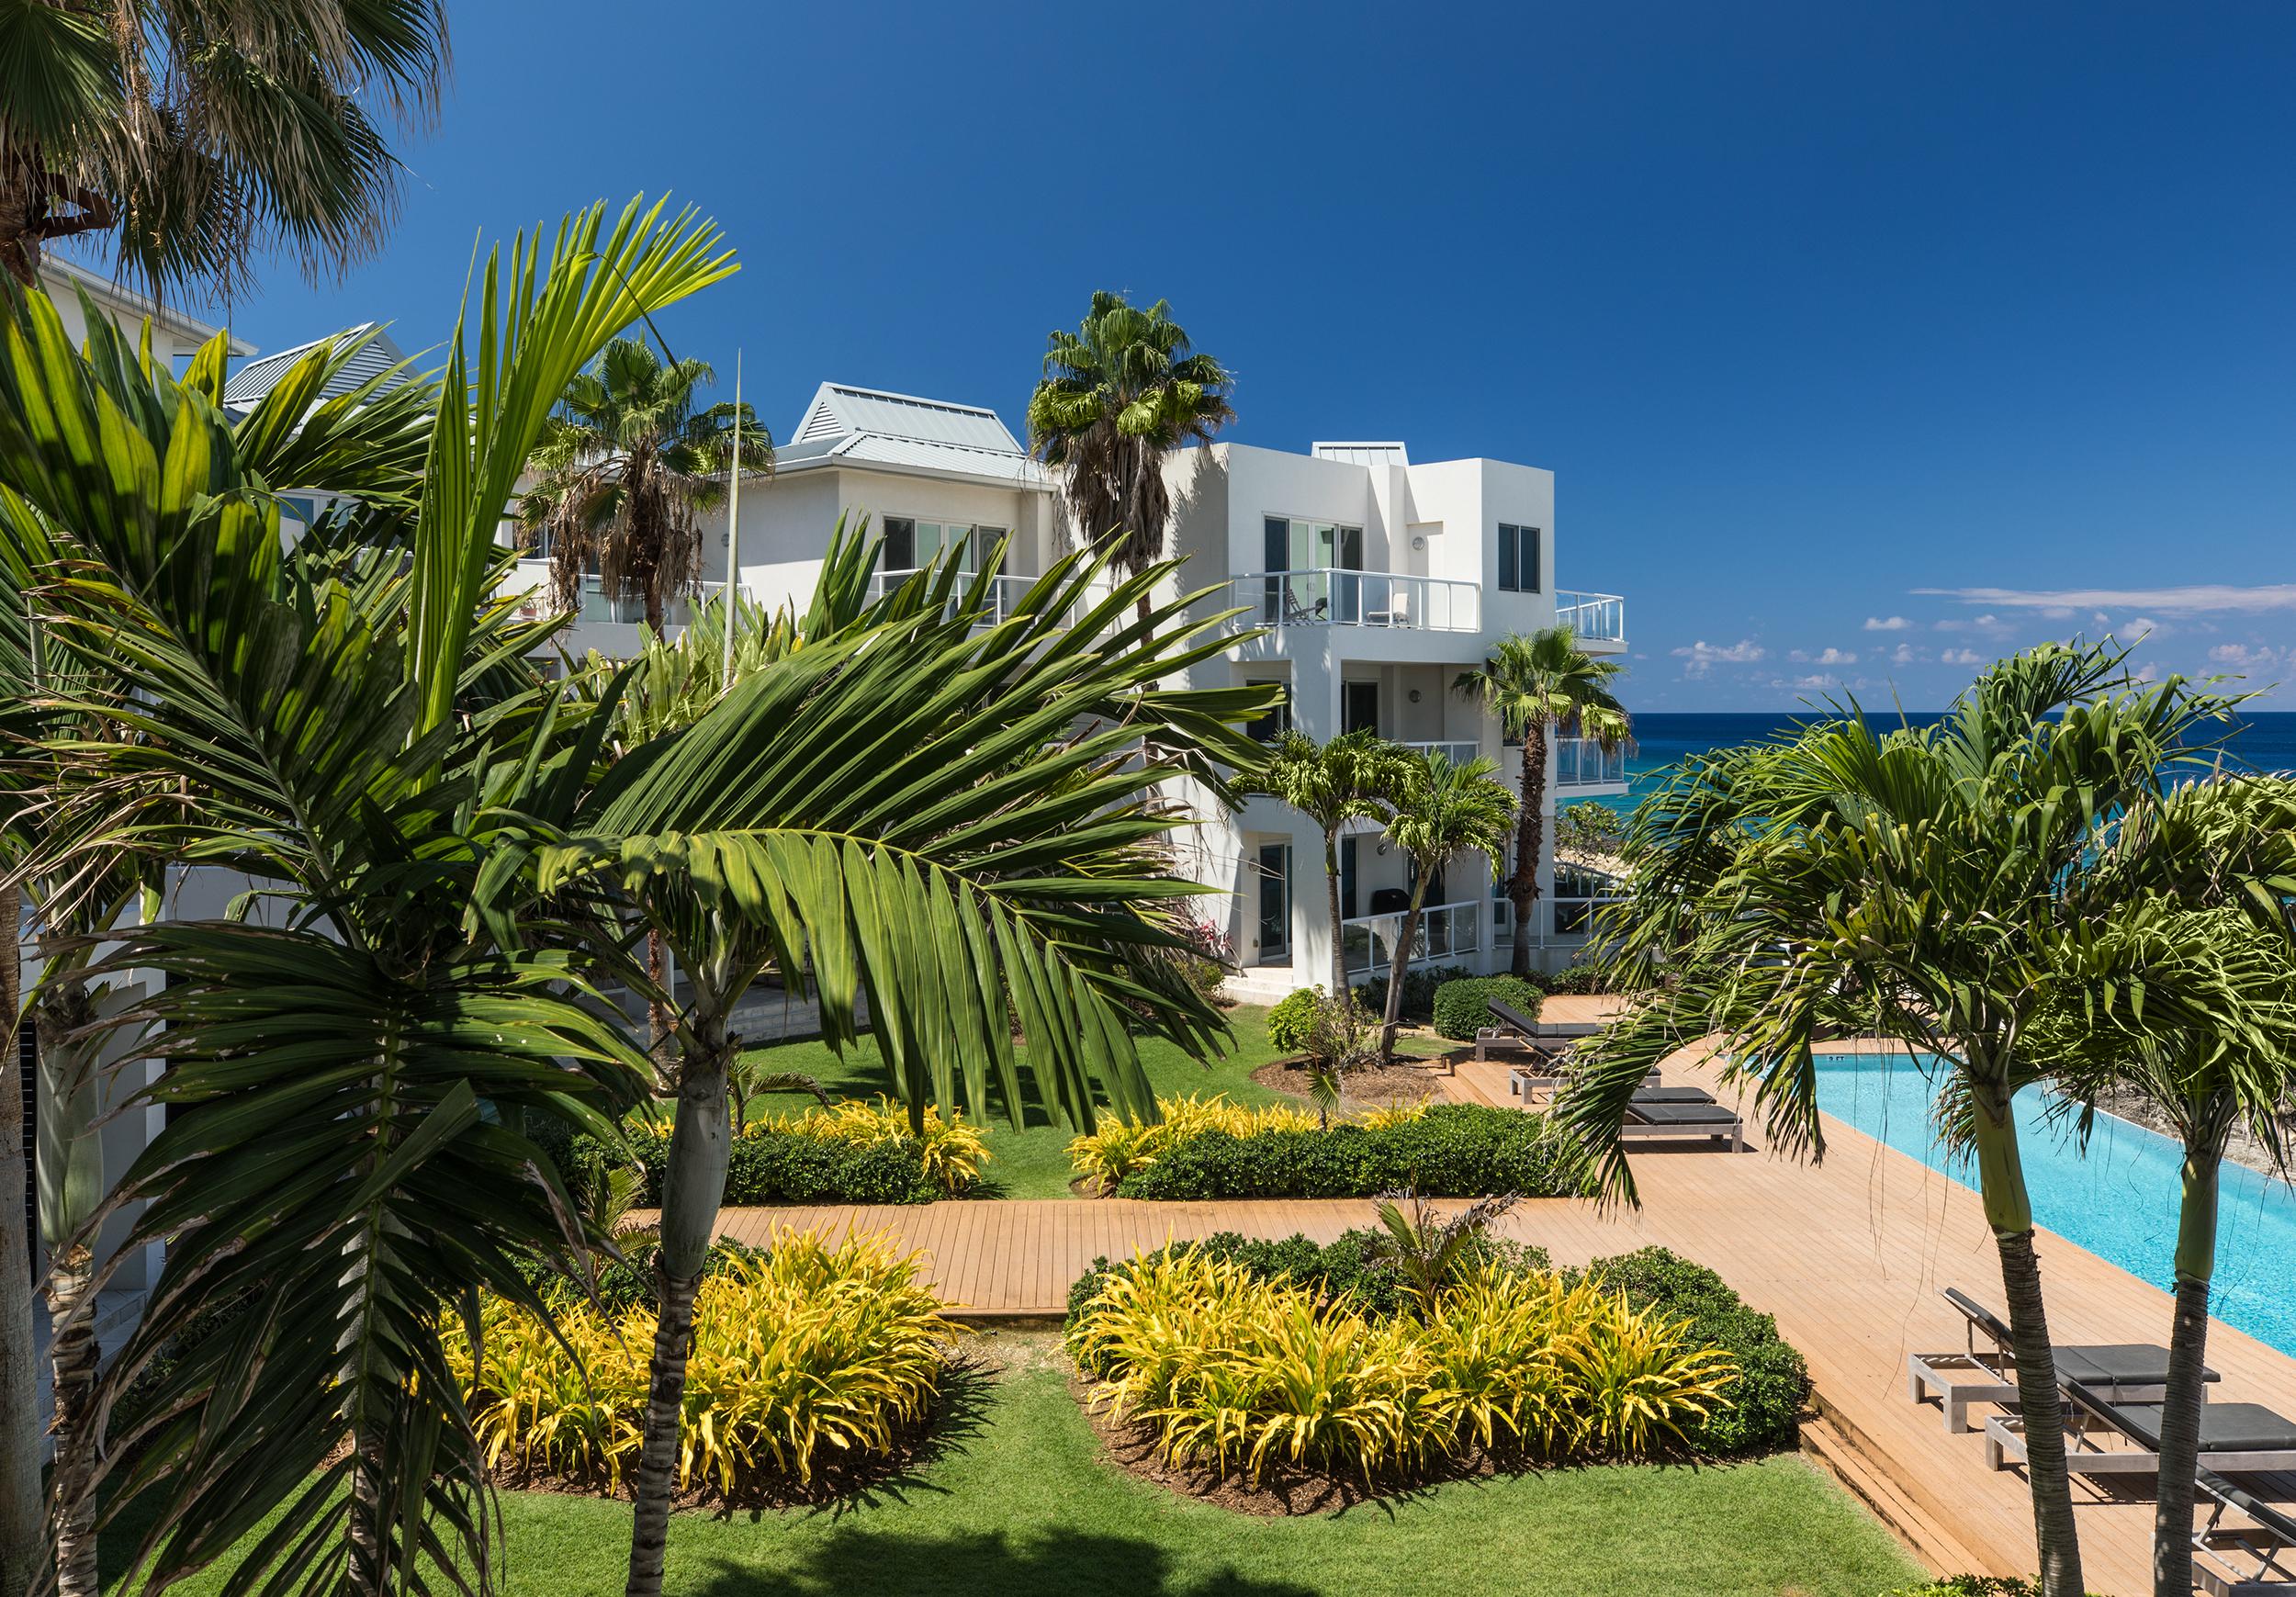 Bronte-Cayman-Island-Seaview_011.jpg